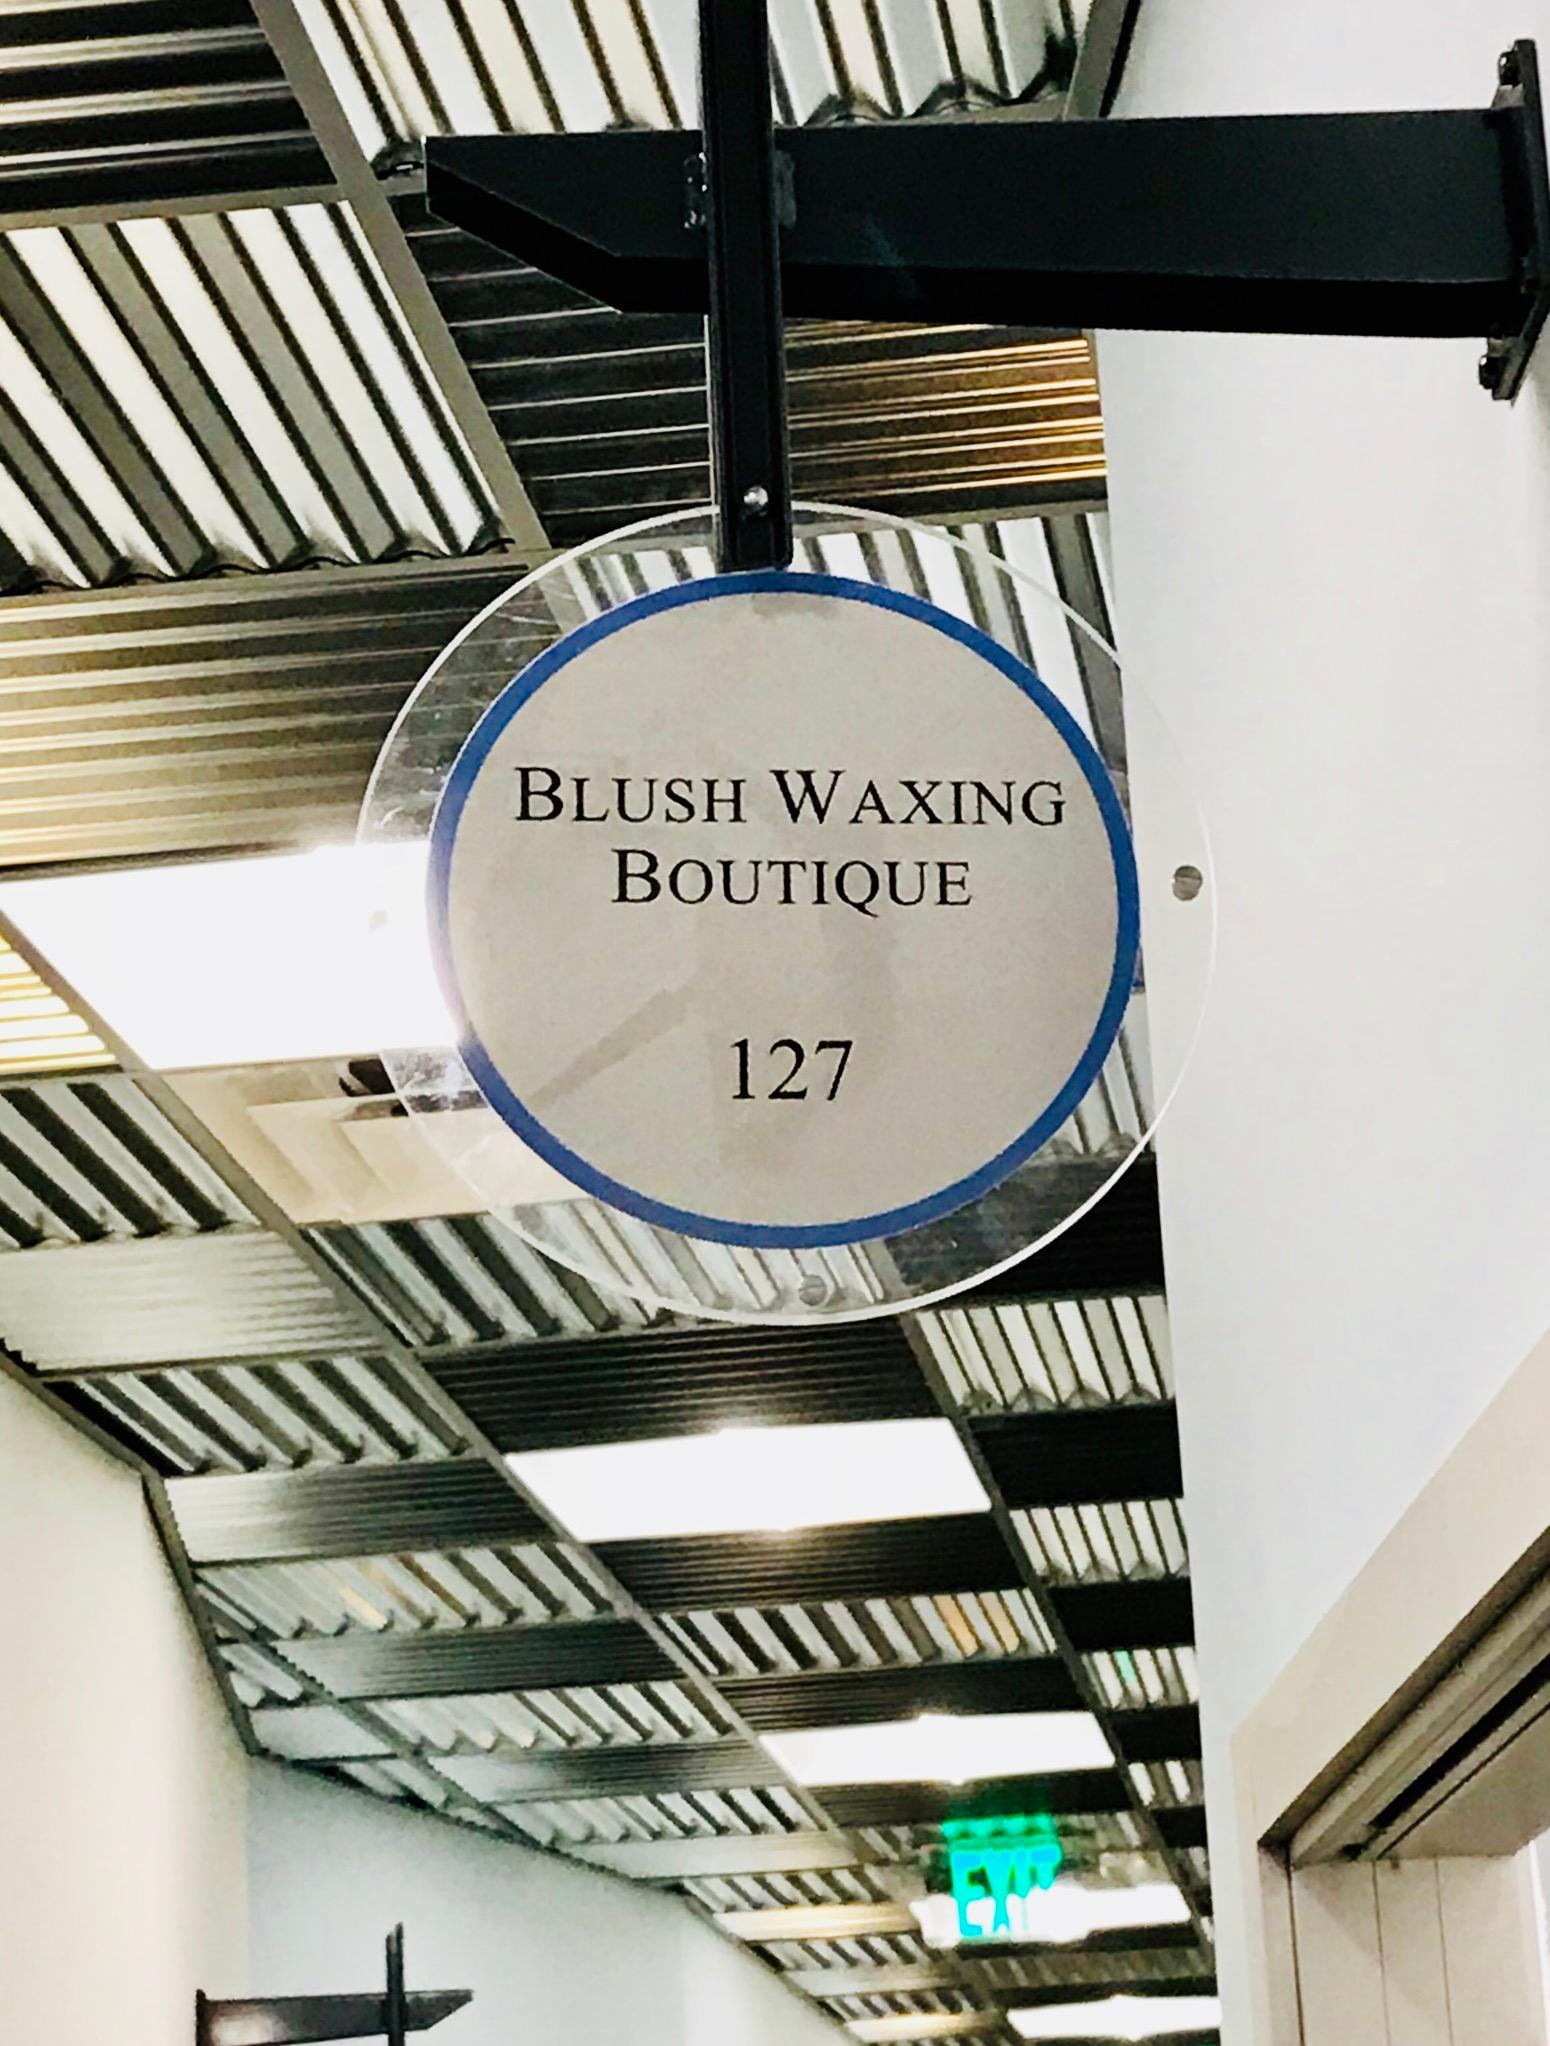 Blush Waxing Boutique image 3